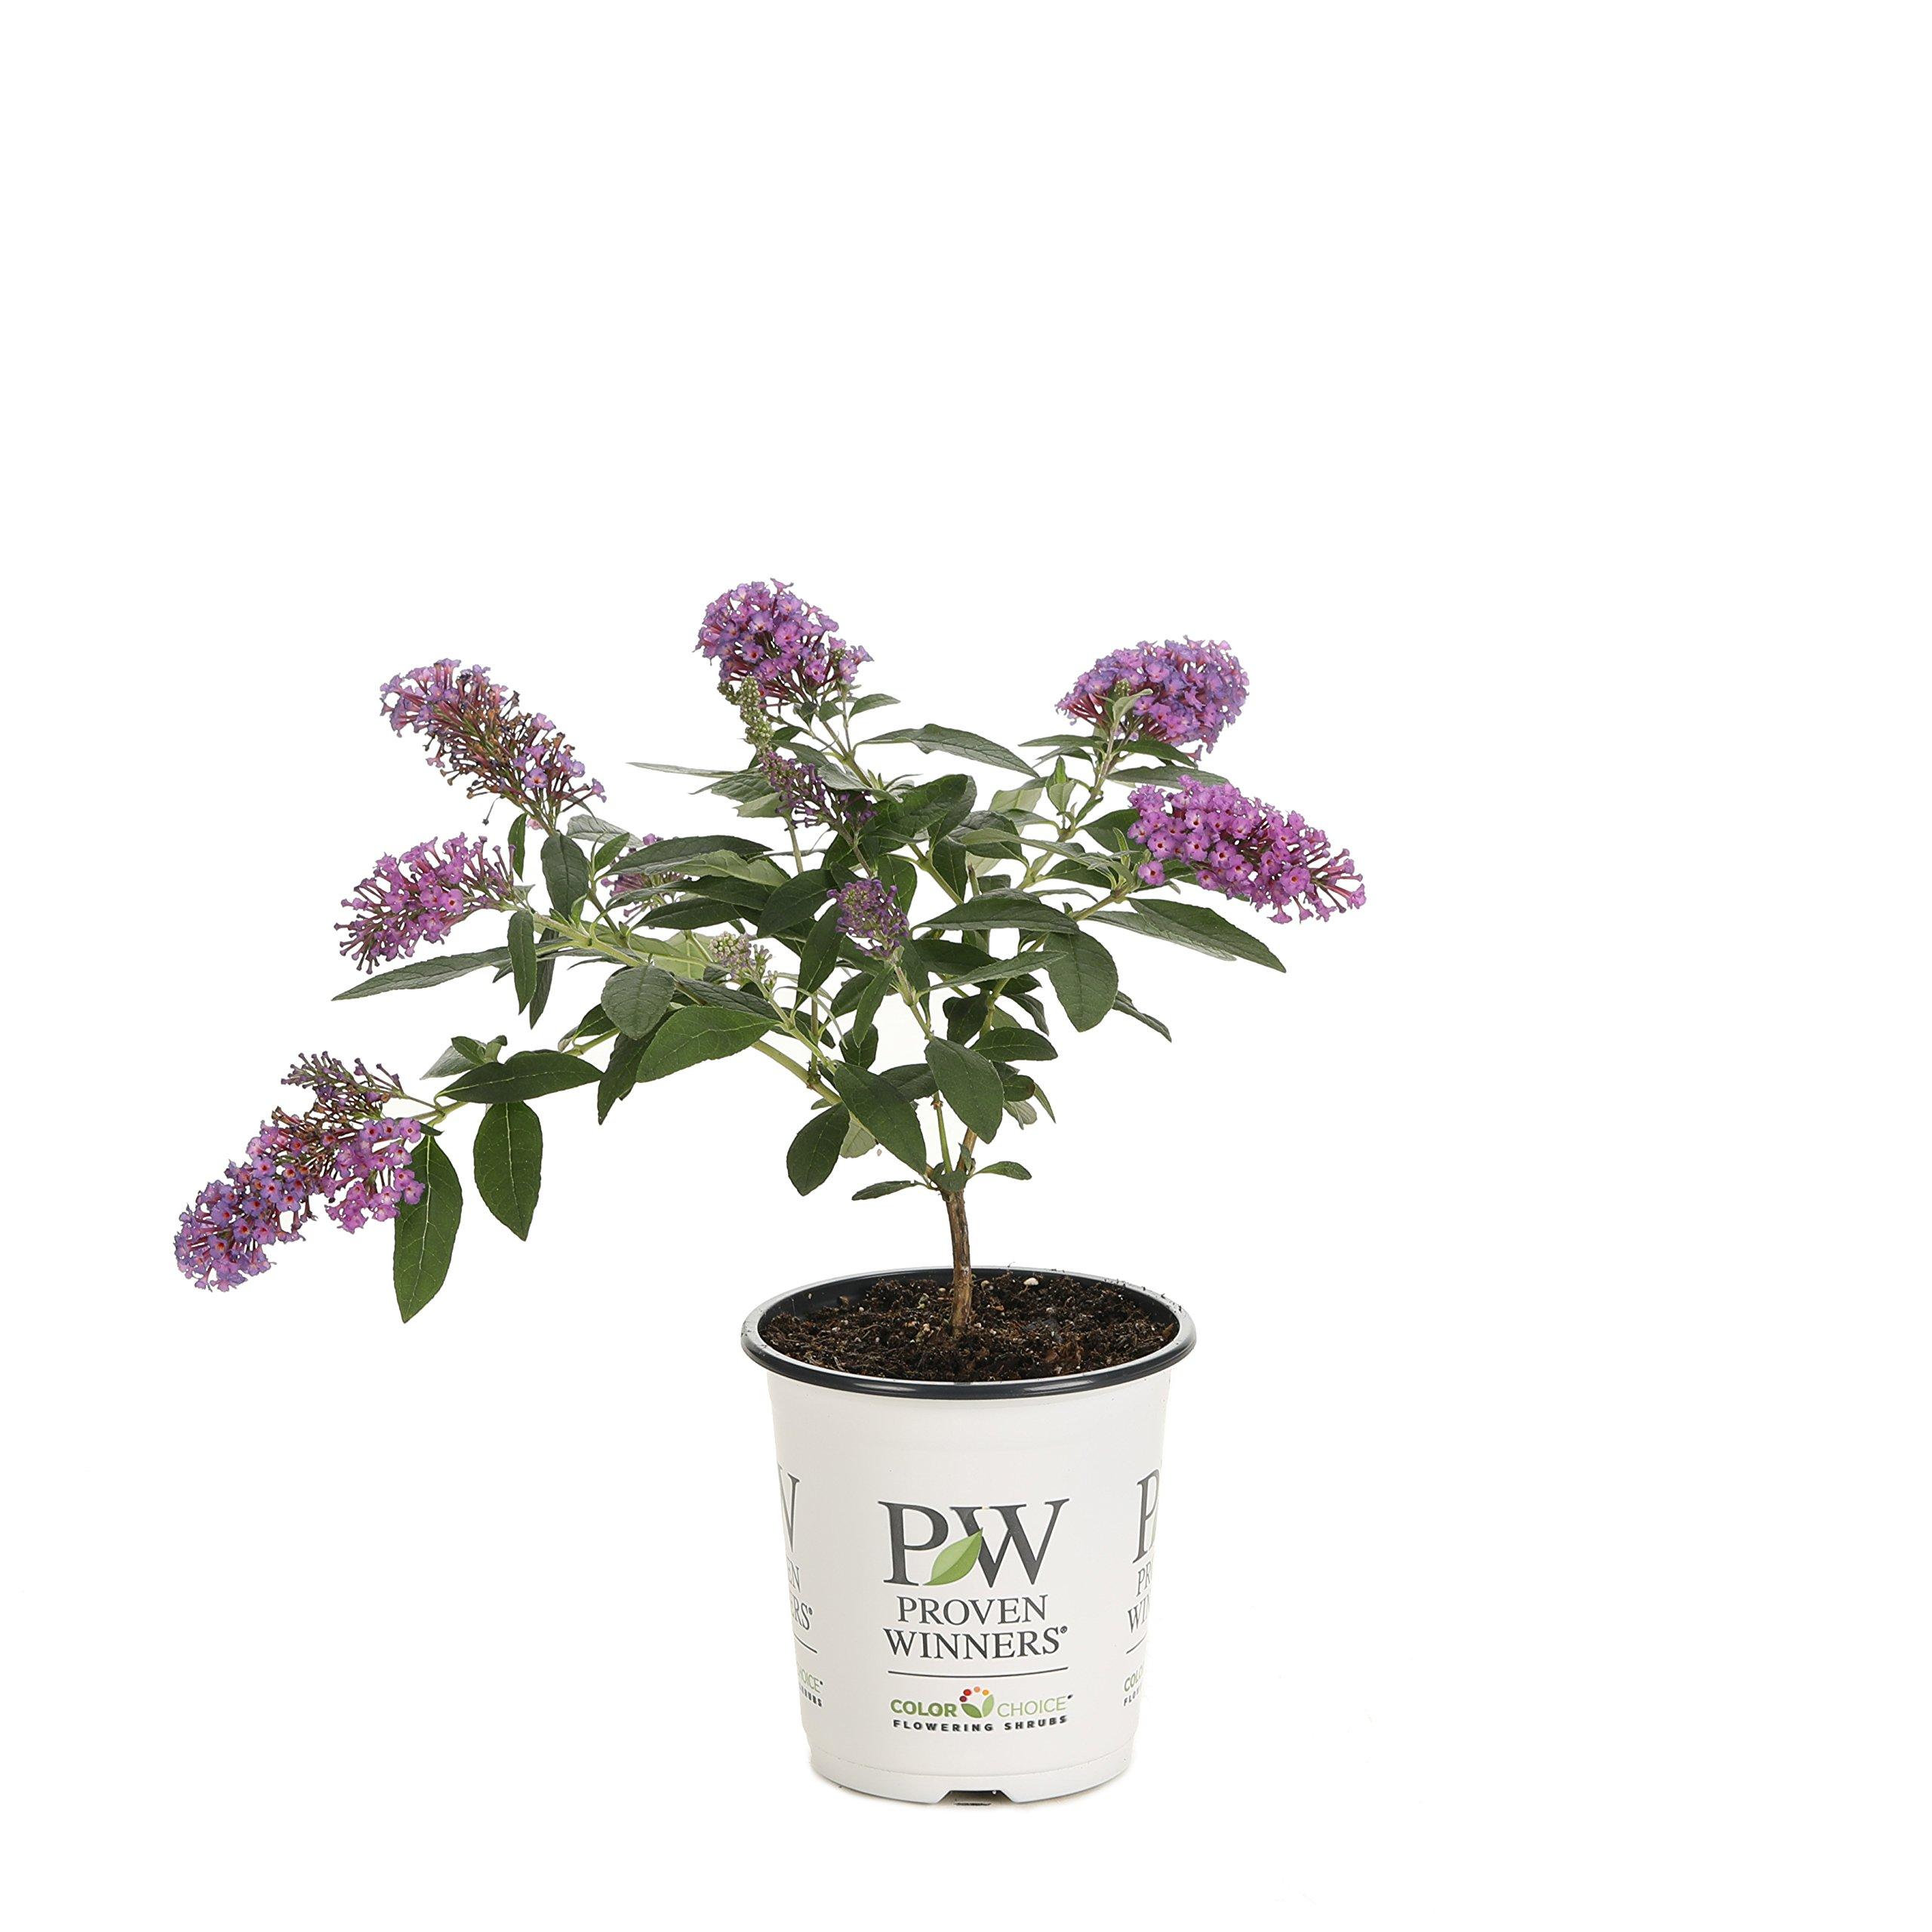 Pugster Periwinkle Butterfly Bush (Buddleia) Live Shrub, Purple Flowers, 4.5 in. Quart